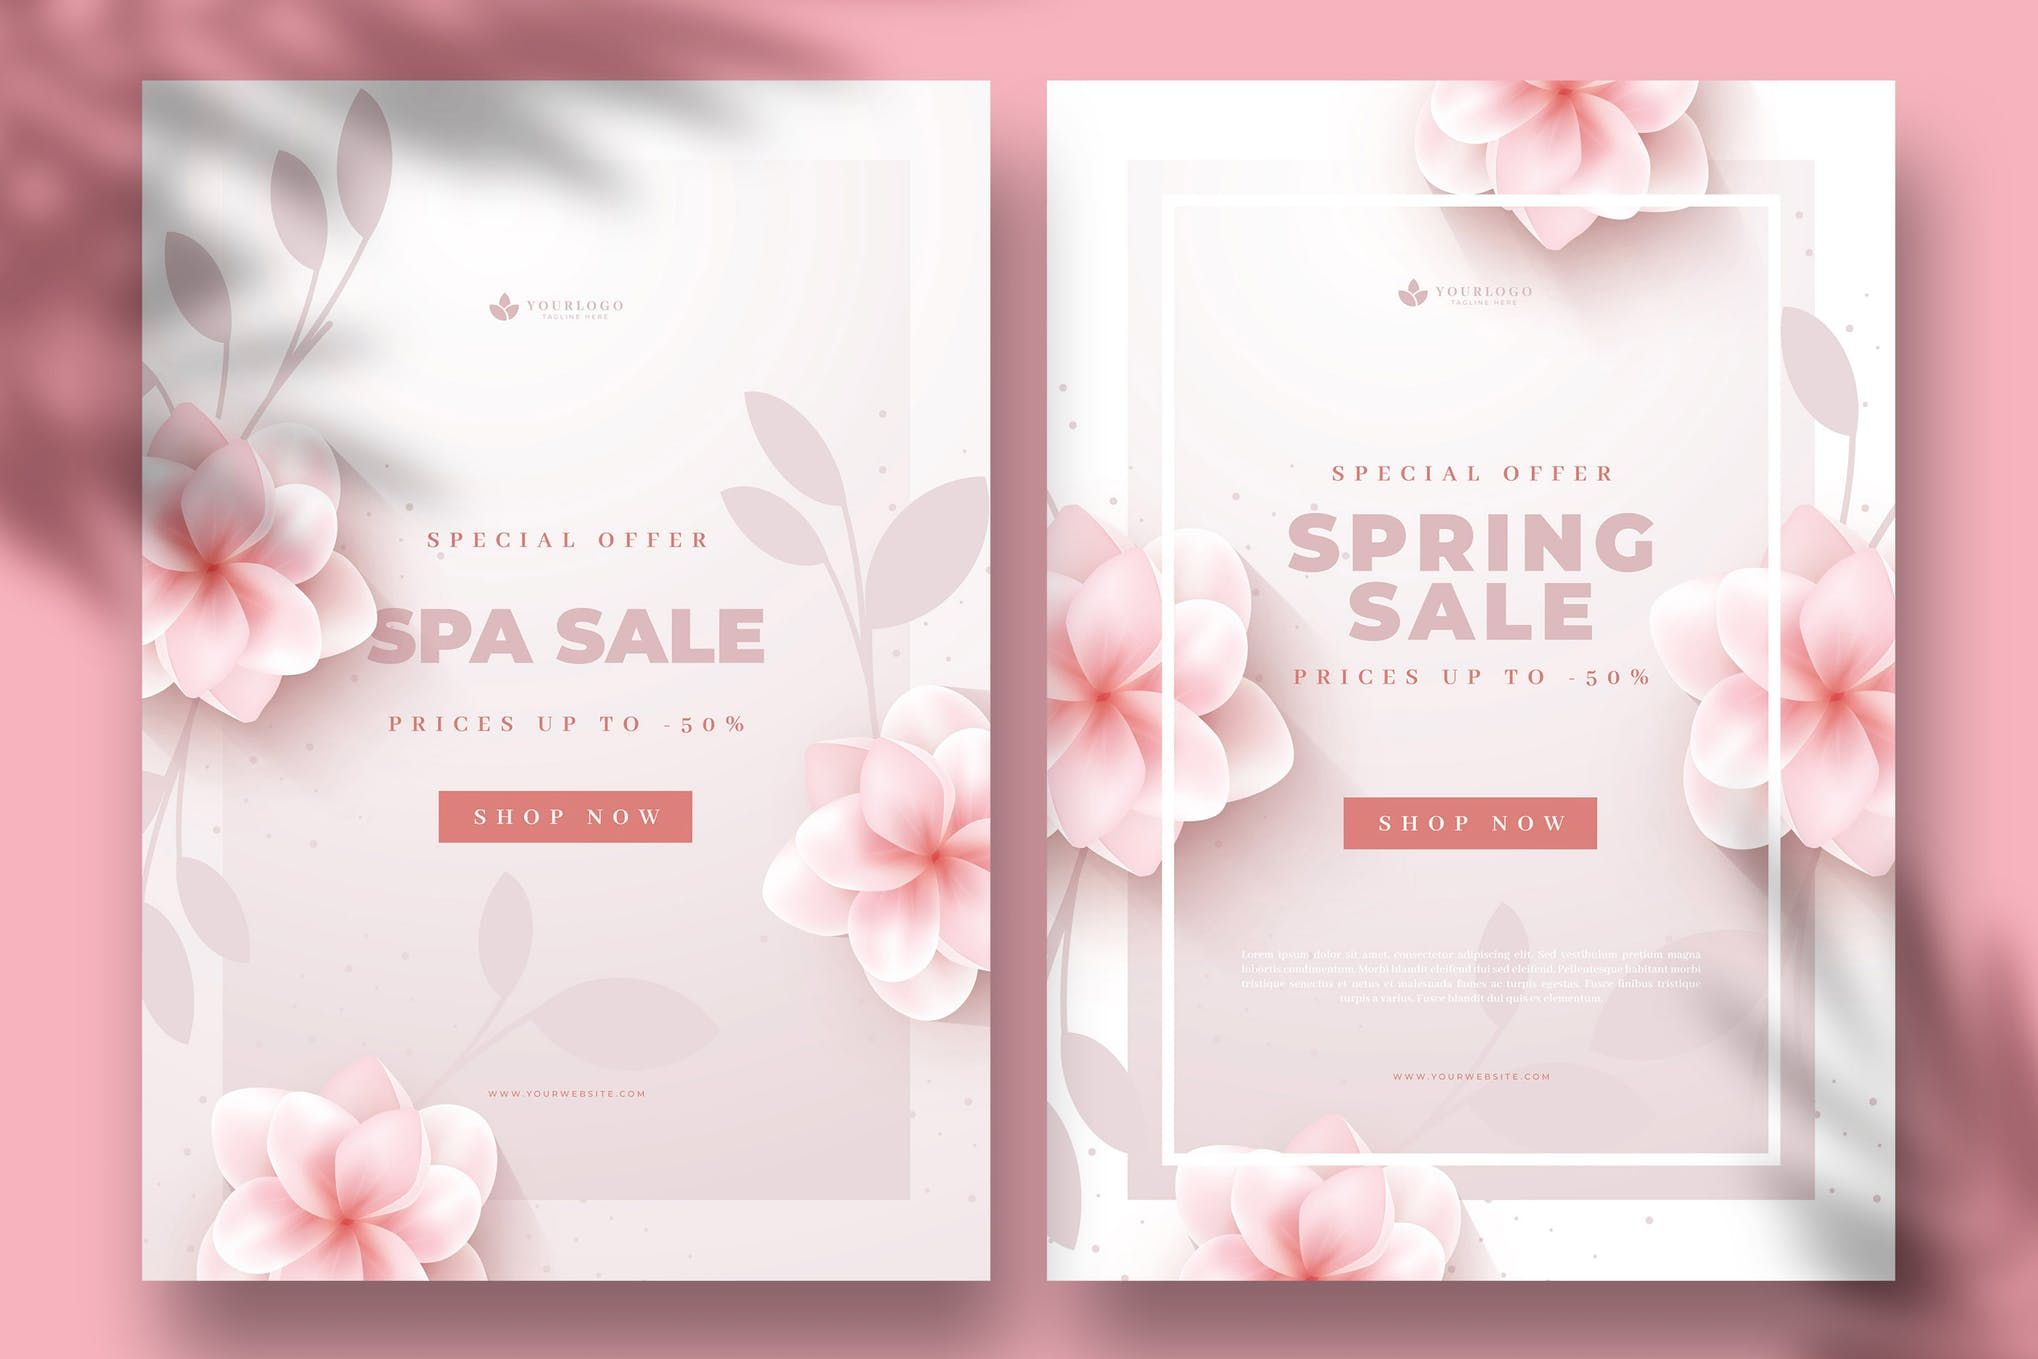 Modern Sales Flyers Design With Flowers In 2020 Sale Flyer Flyer Design Flyer